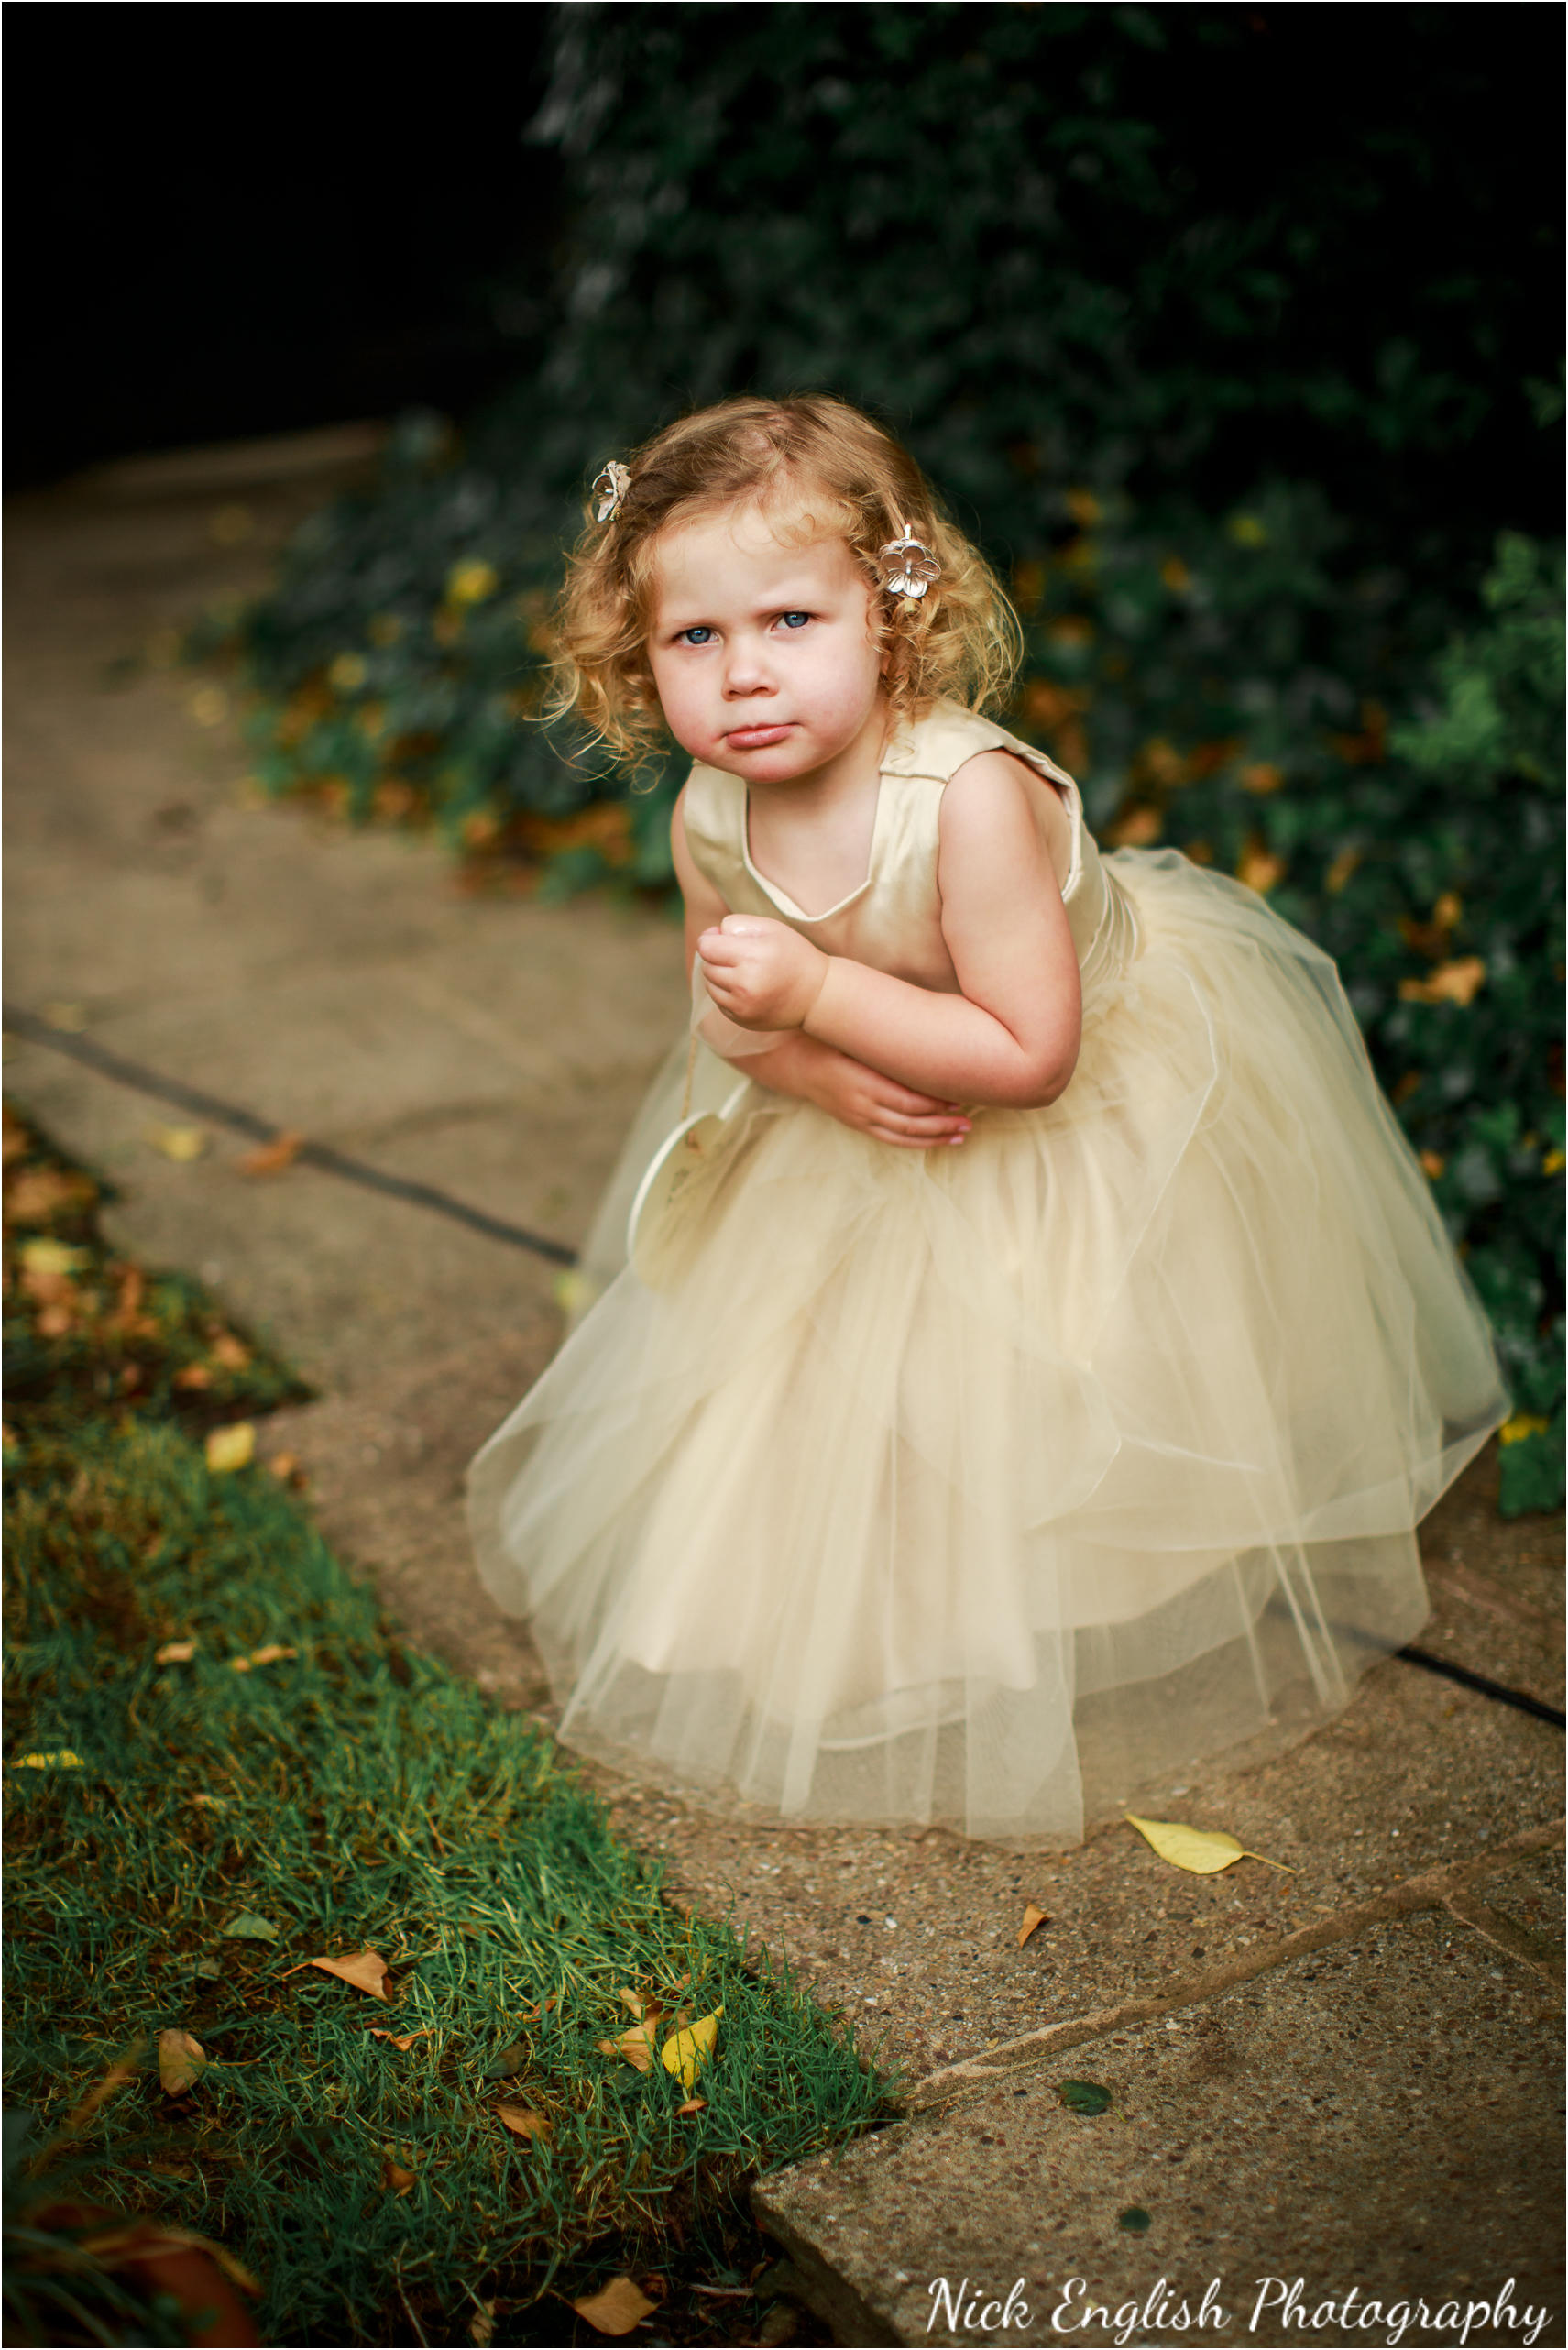 Emily David Wedding Photographs at Barton Grange Preston by Nick English Photography 124jpg.jpeg